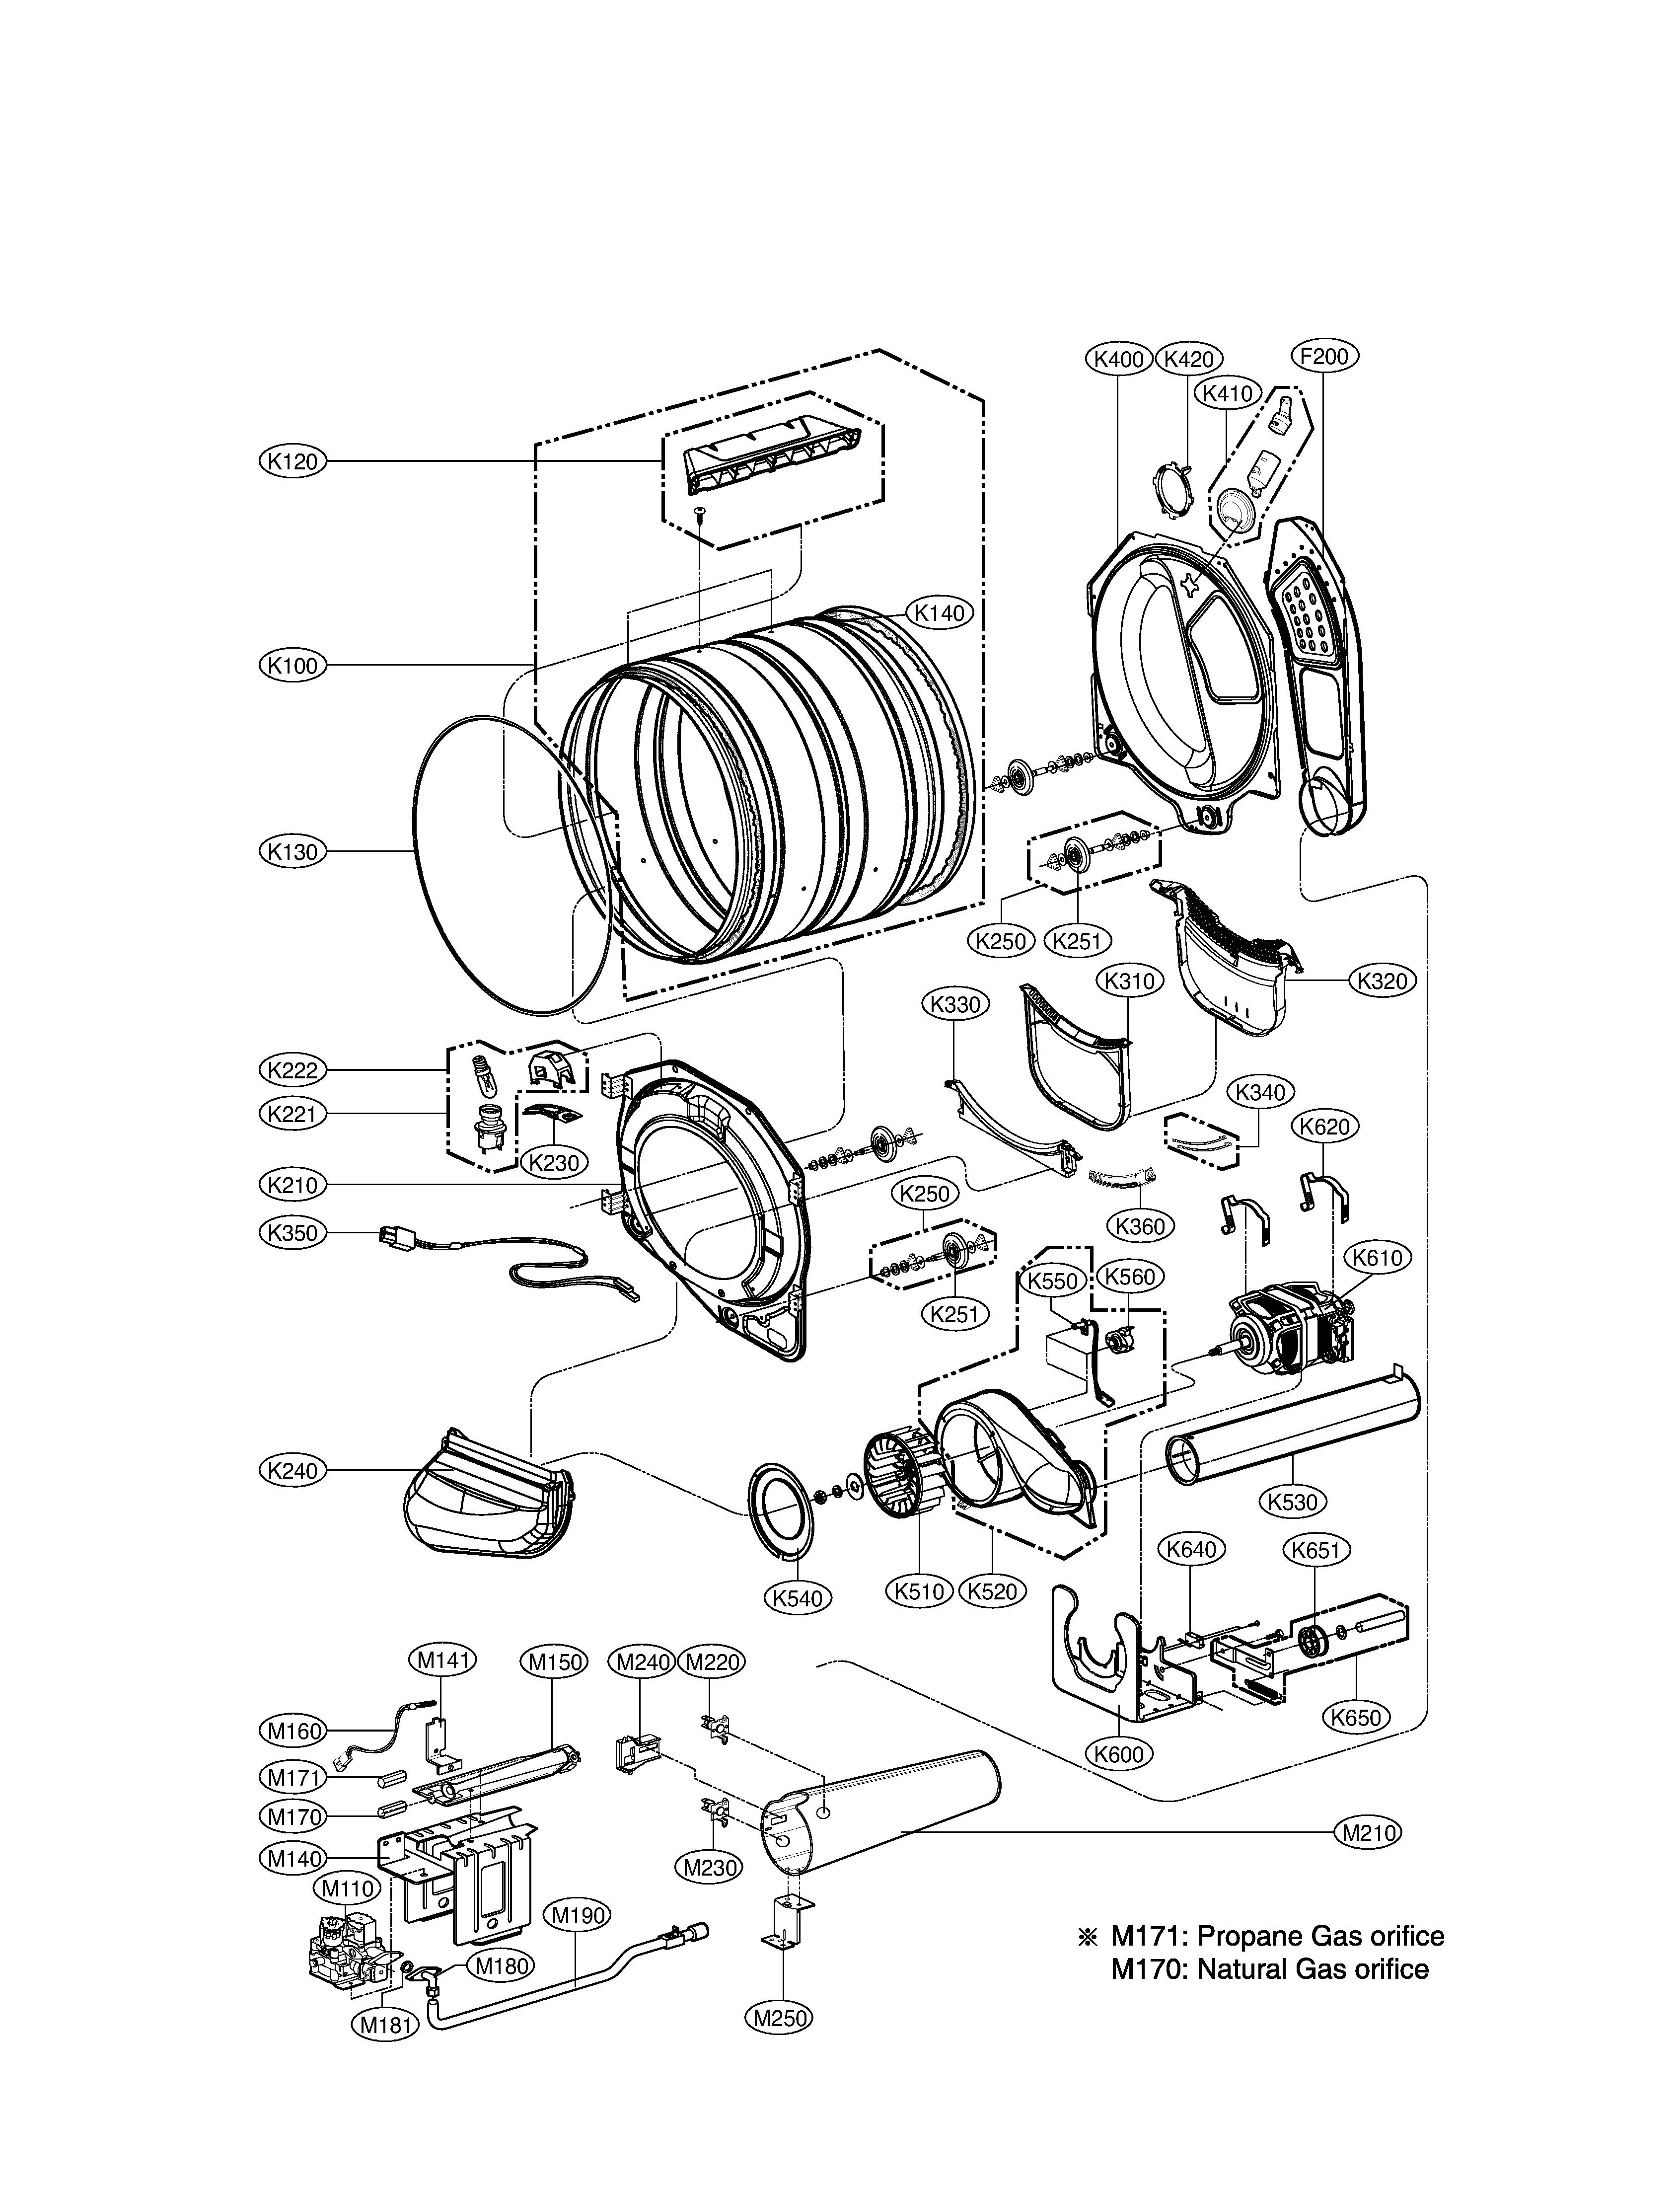 drum motor diagram and parts list for lg dryer parts model diagram dishwasher parts diagram ge dryer parts diagram dometic [ 3383 x 4405 Pixel ]